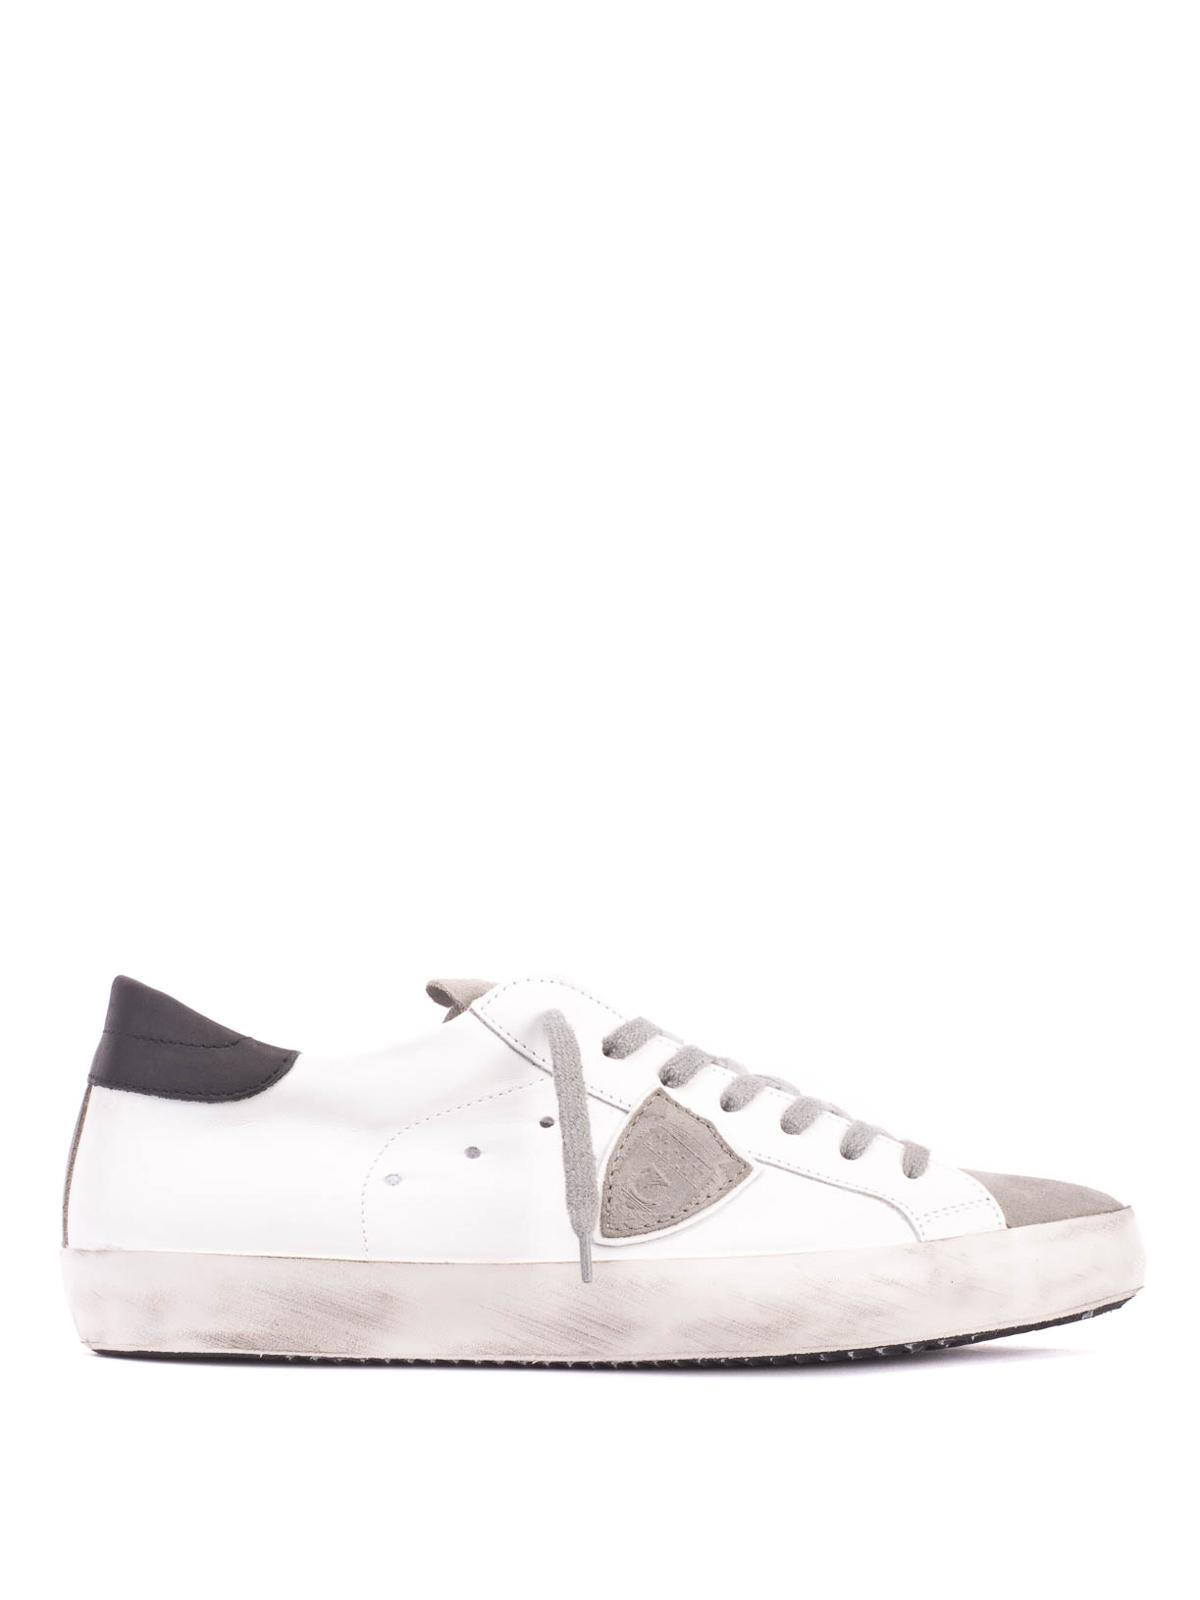 Philippe model Low top sneakers